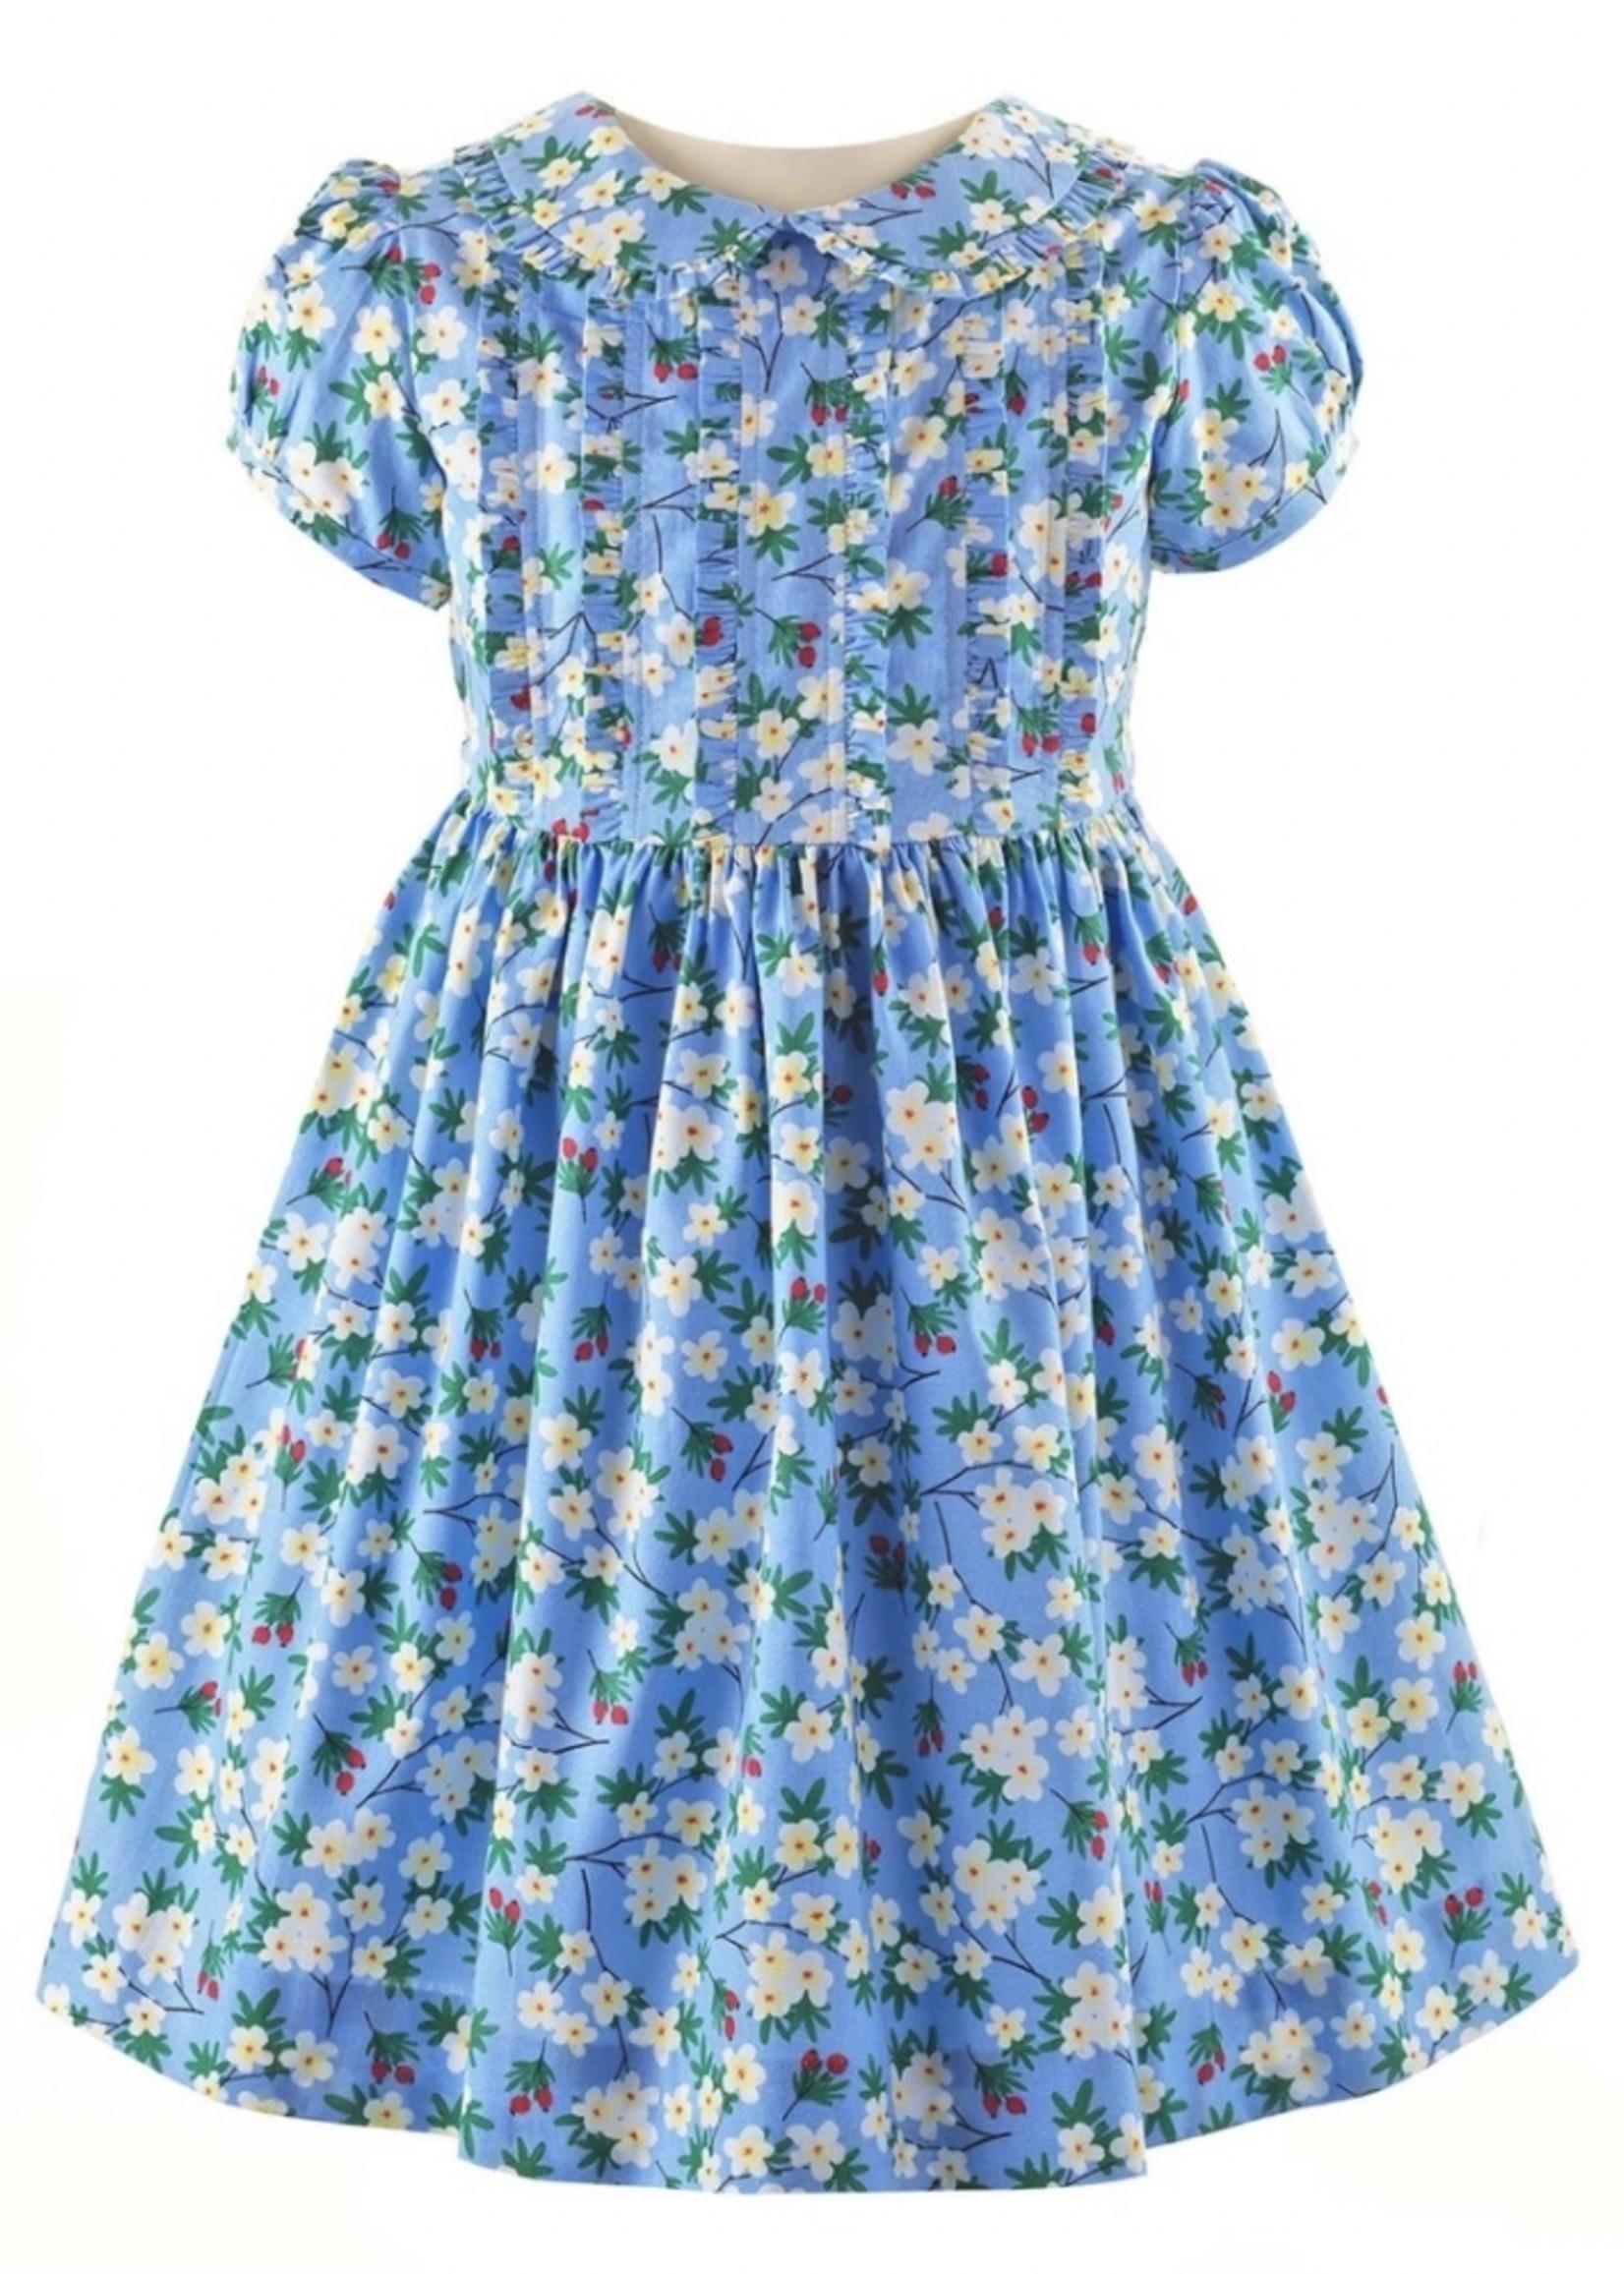 Winter Bloom Frill Dress & Bloomers Blue